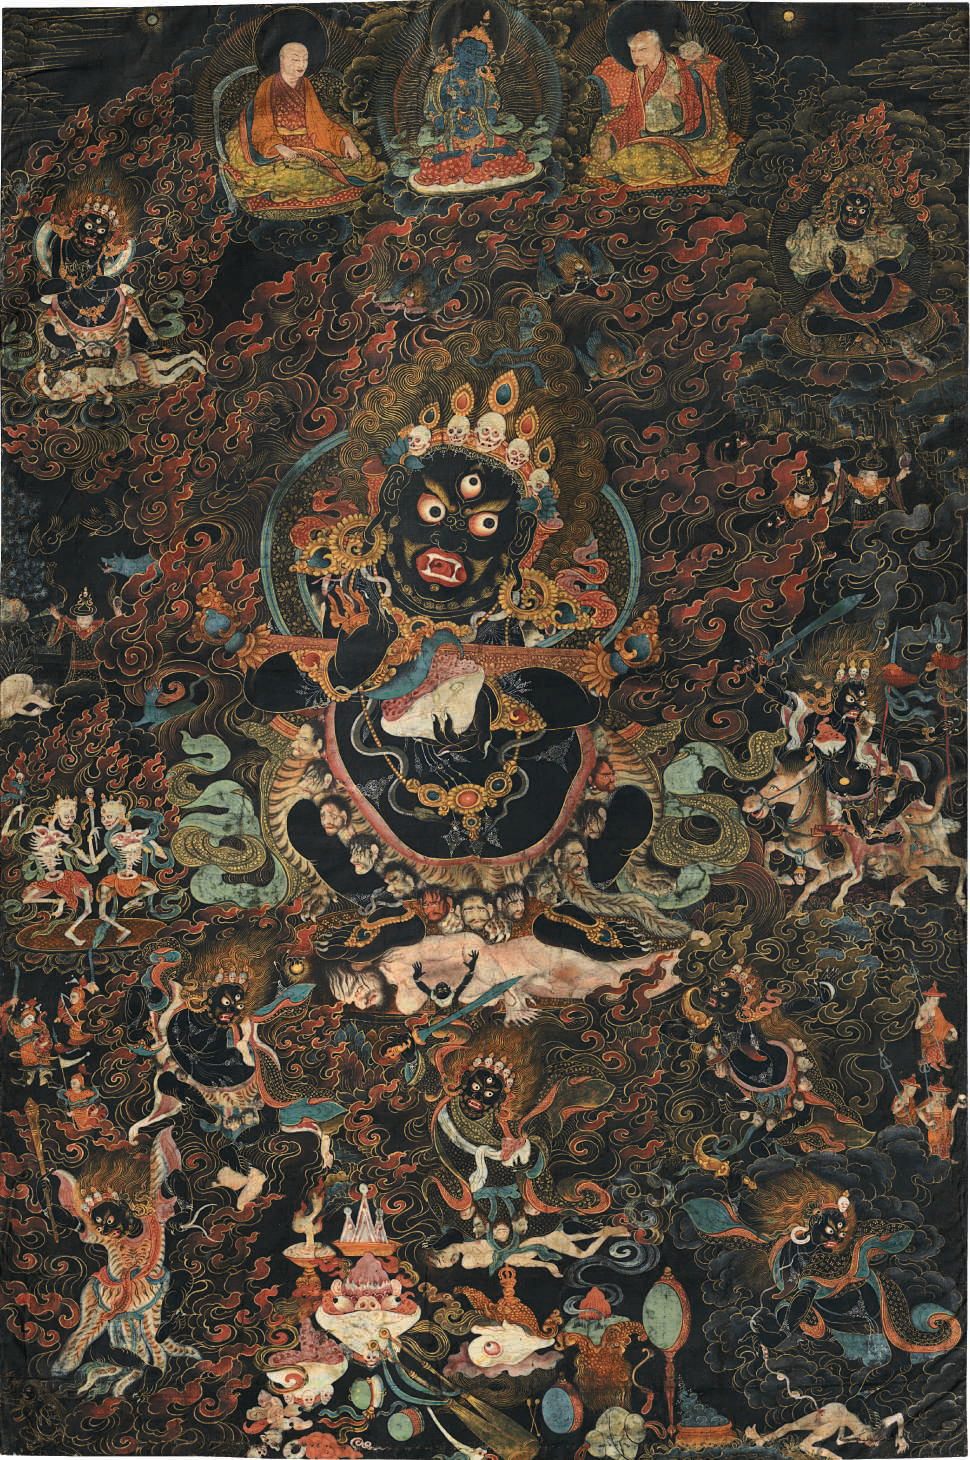 Epingle Par Bryce Whitacre Sur Stuff To Buy En 2020 Mandala Tibetains